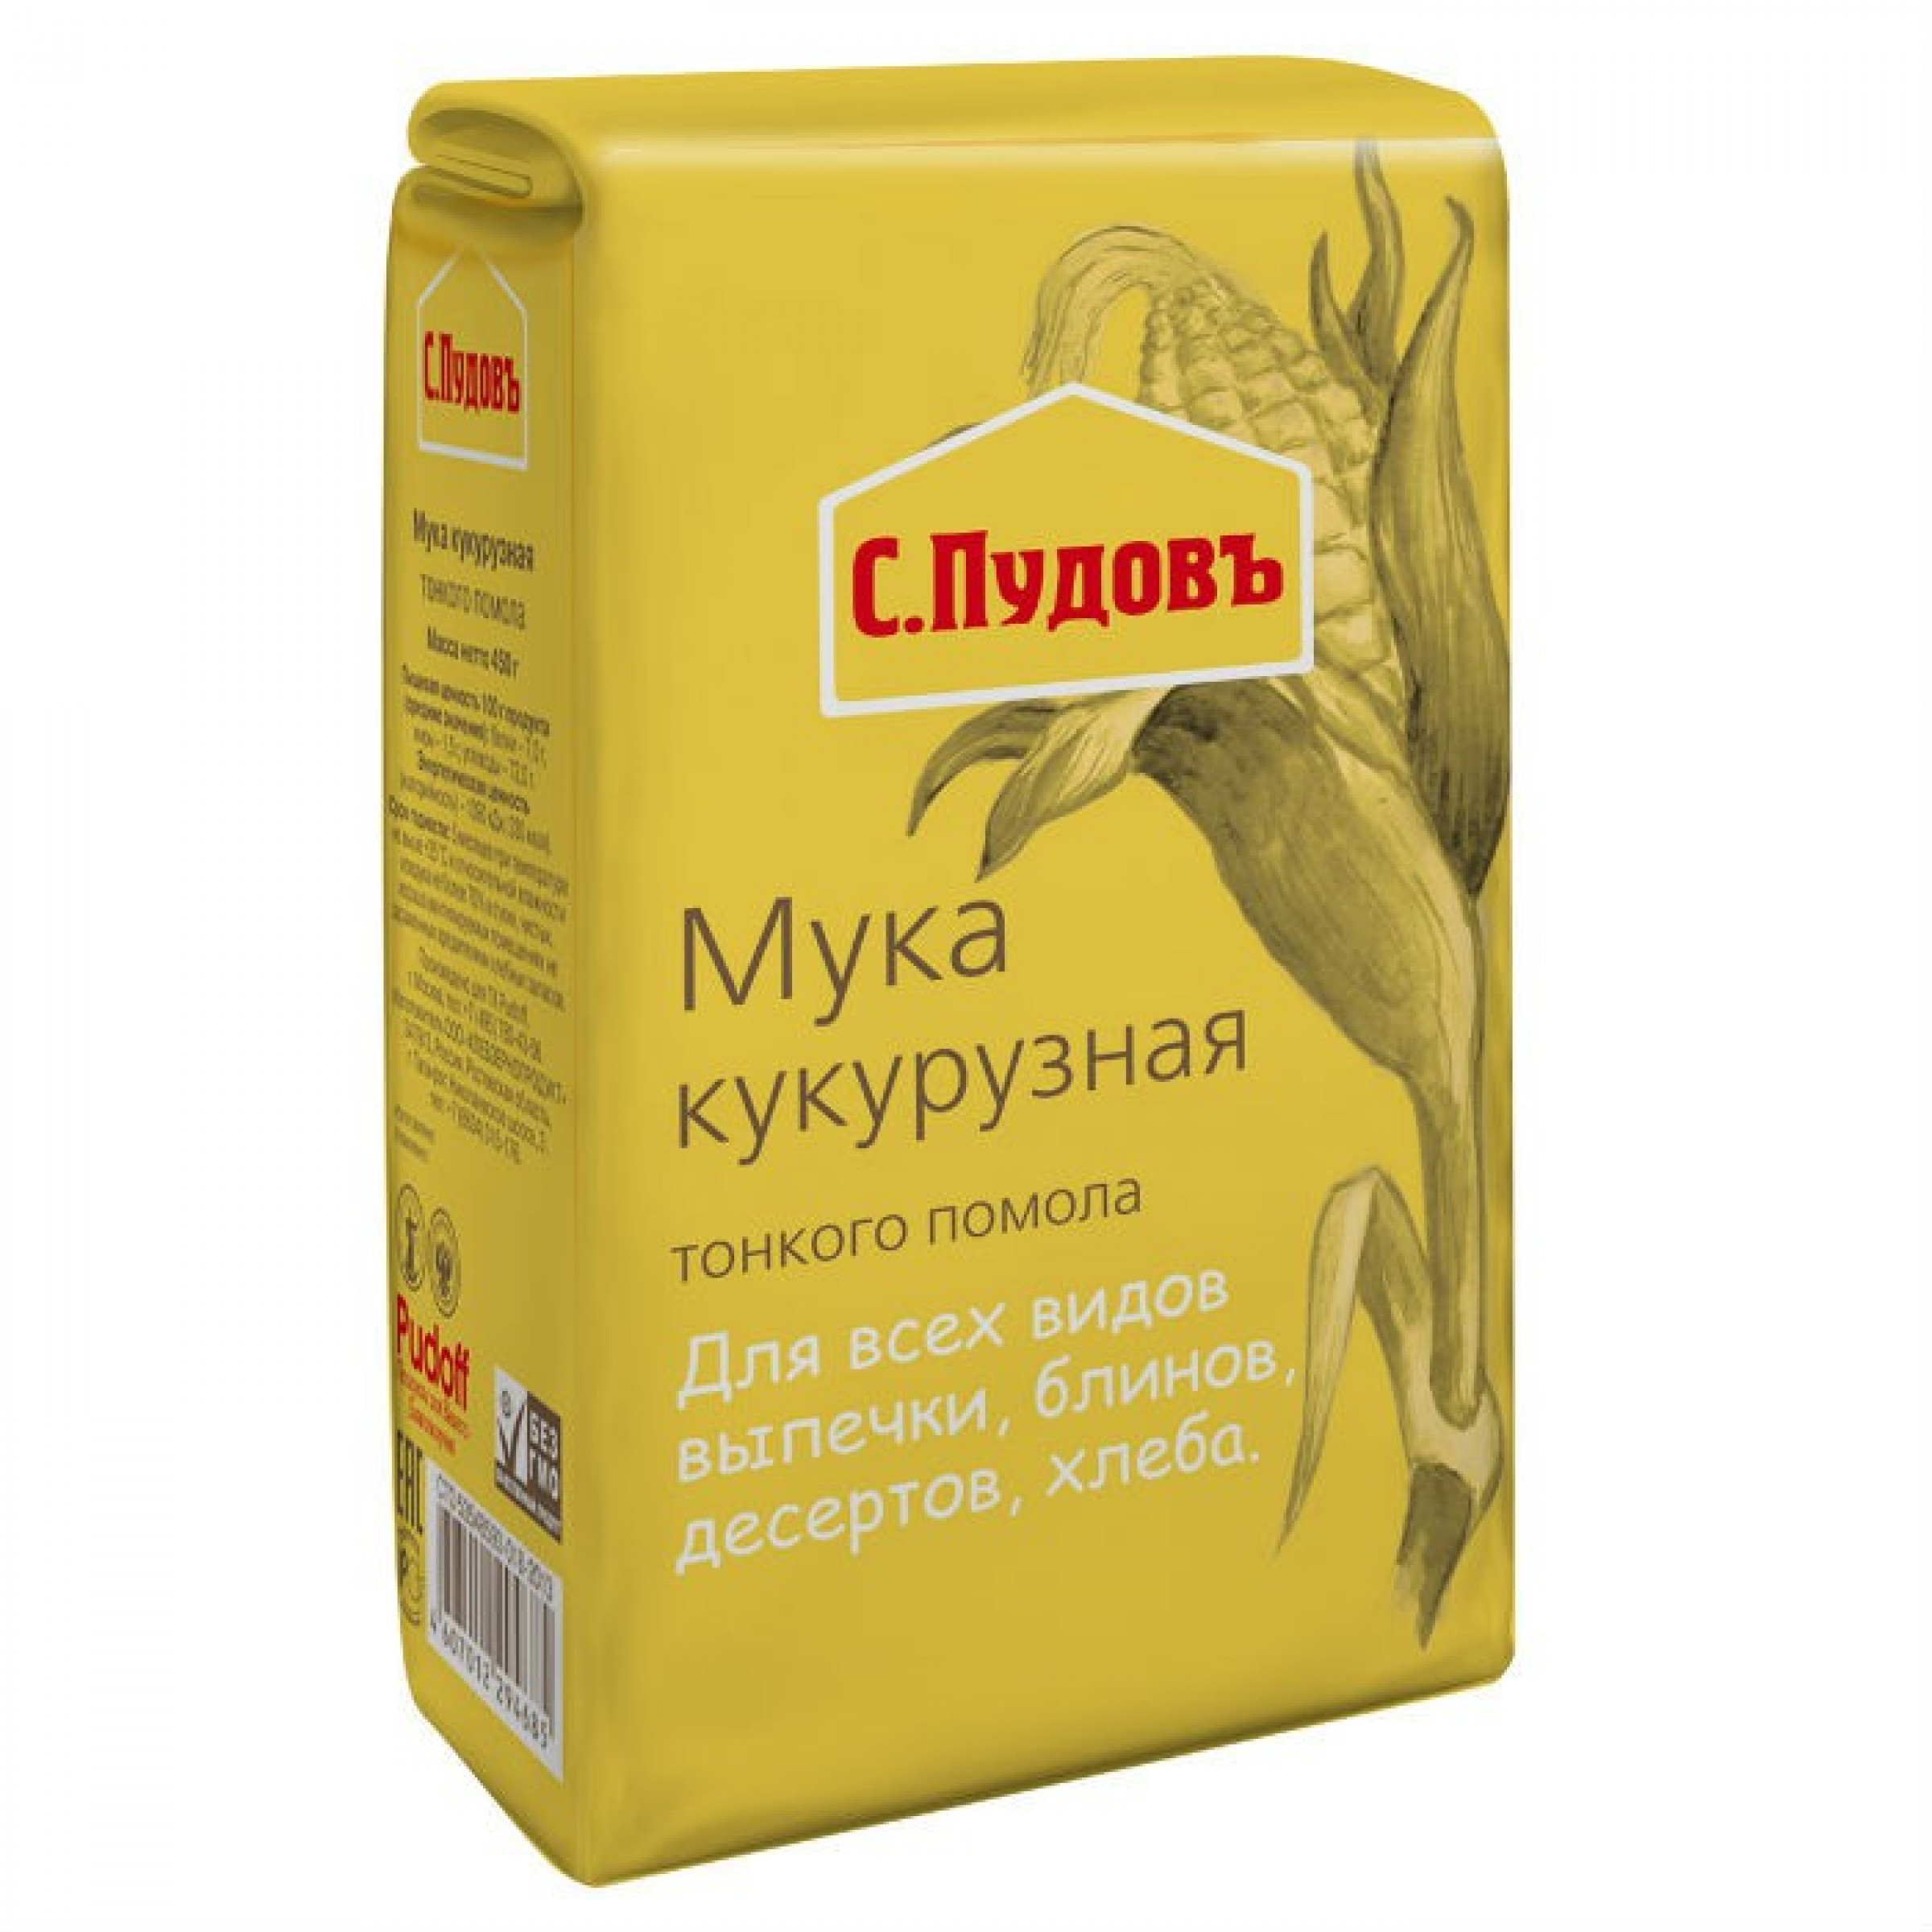 Кукурузная мука тонкого помола С. Пудовъ, 450 г